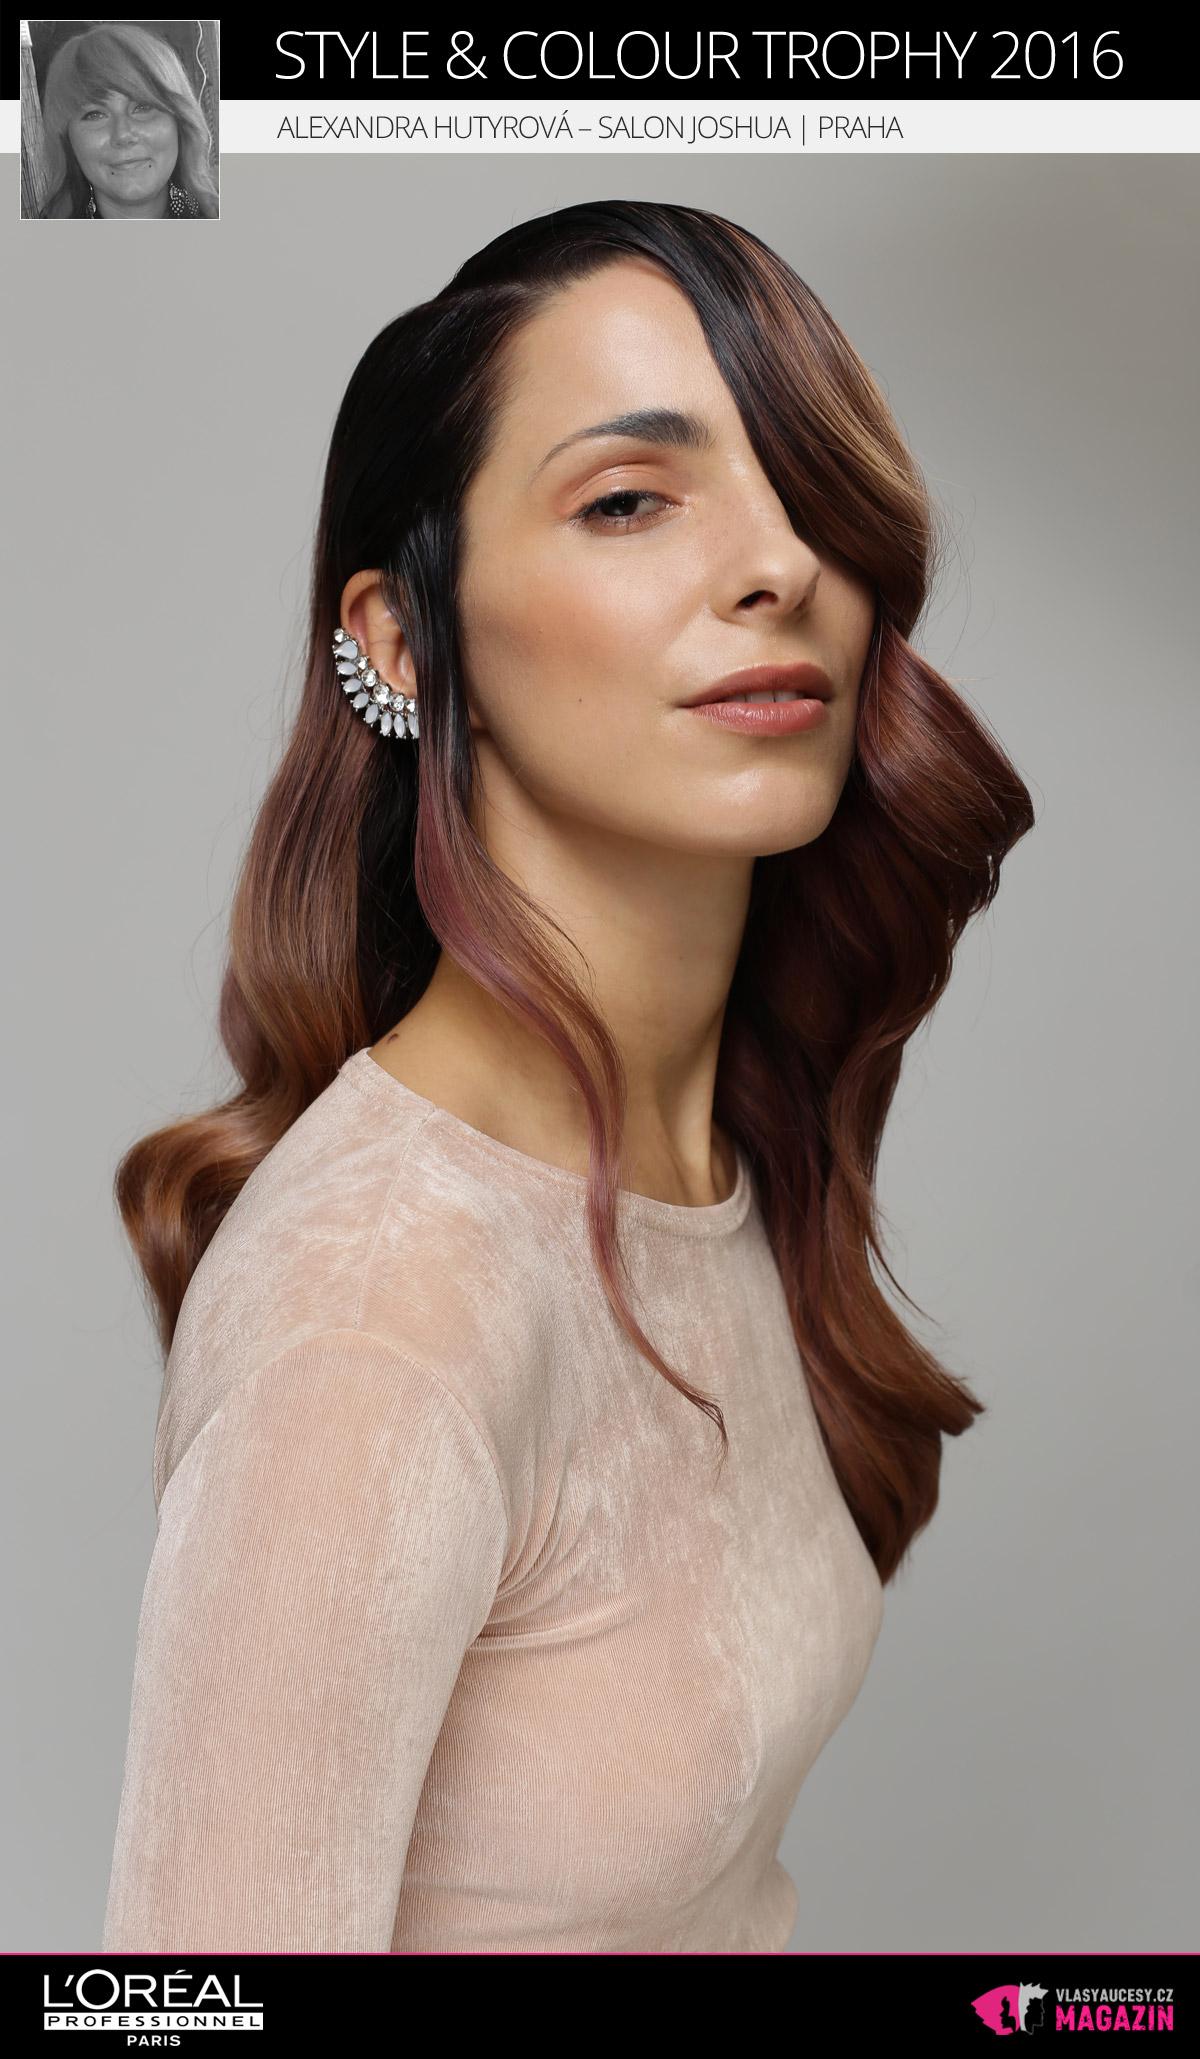 Alexandra Hutyrová –Salon Joshua, Praha | L'Oréal Style & Colour Trophy 2016